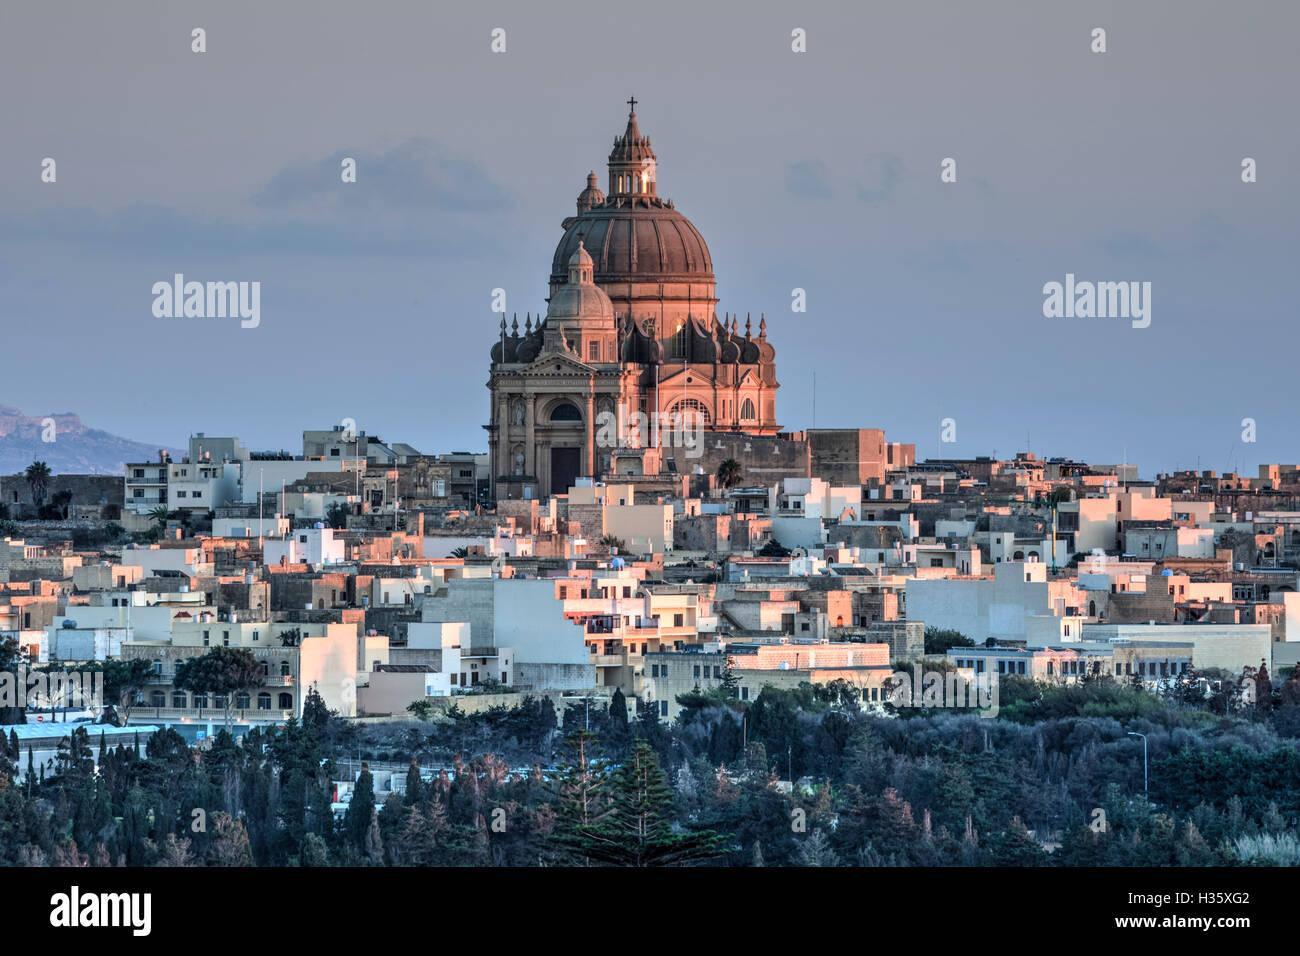 Rotunda, Xewkija, Gozo, Malta - Stock Image